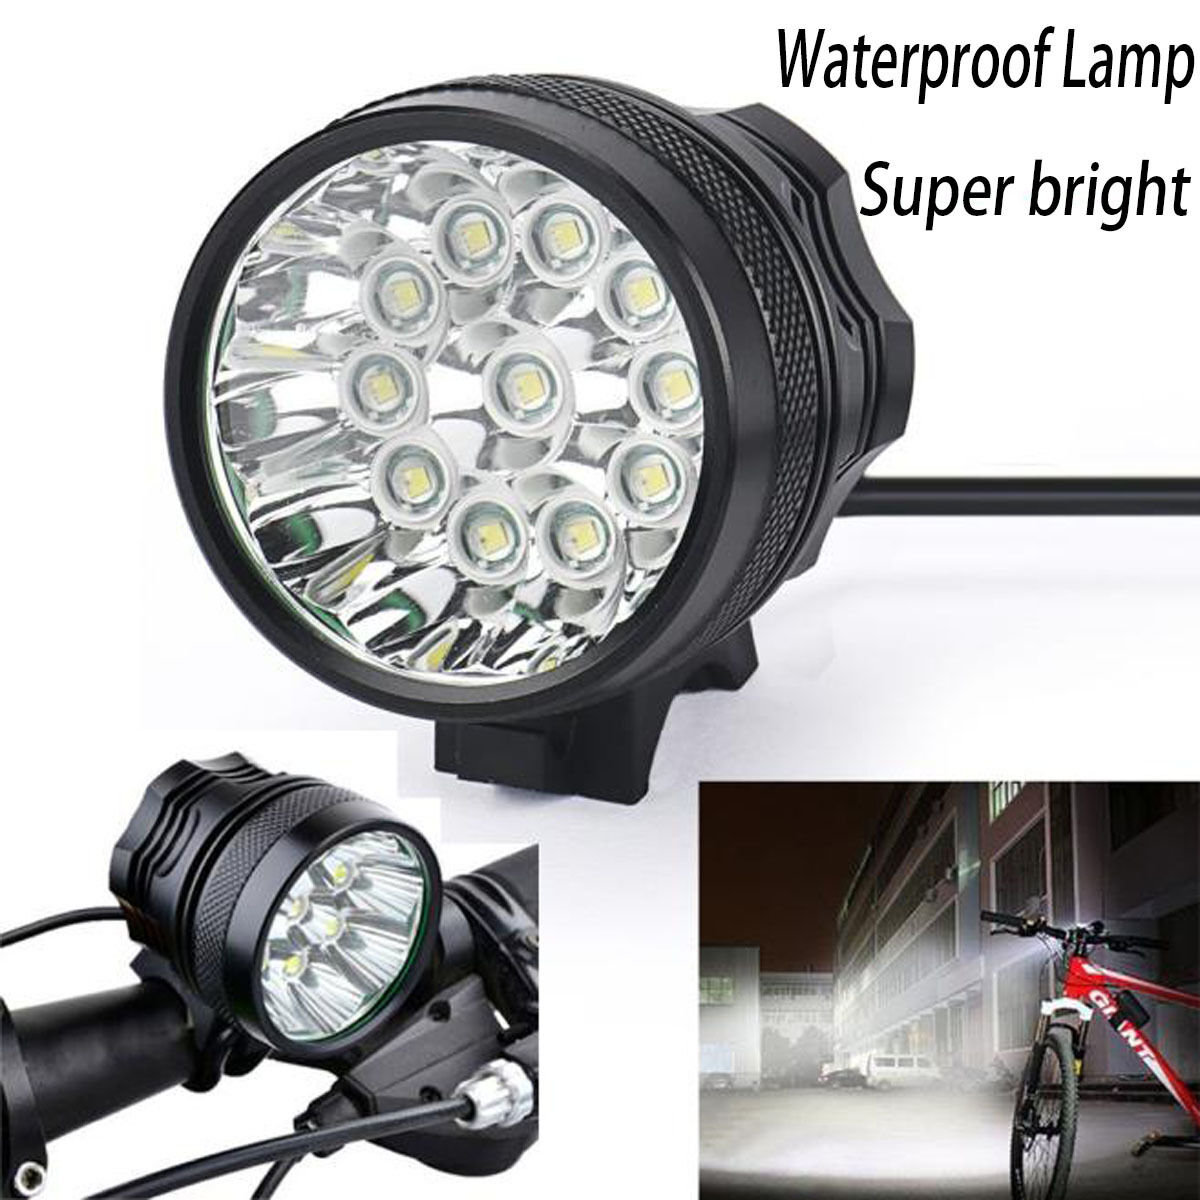 28000 Lm 11x Cree T6 Led 3 Modes Bicycle Lamp Bike Light Headlight